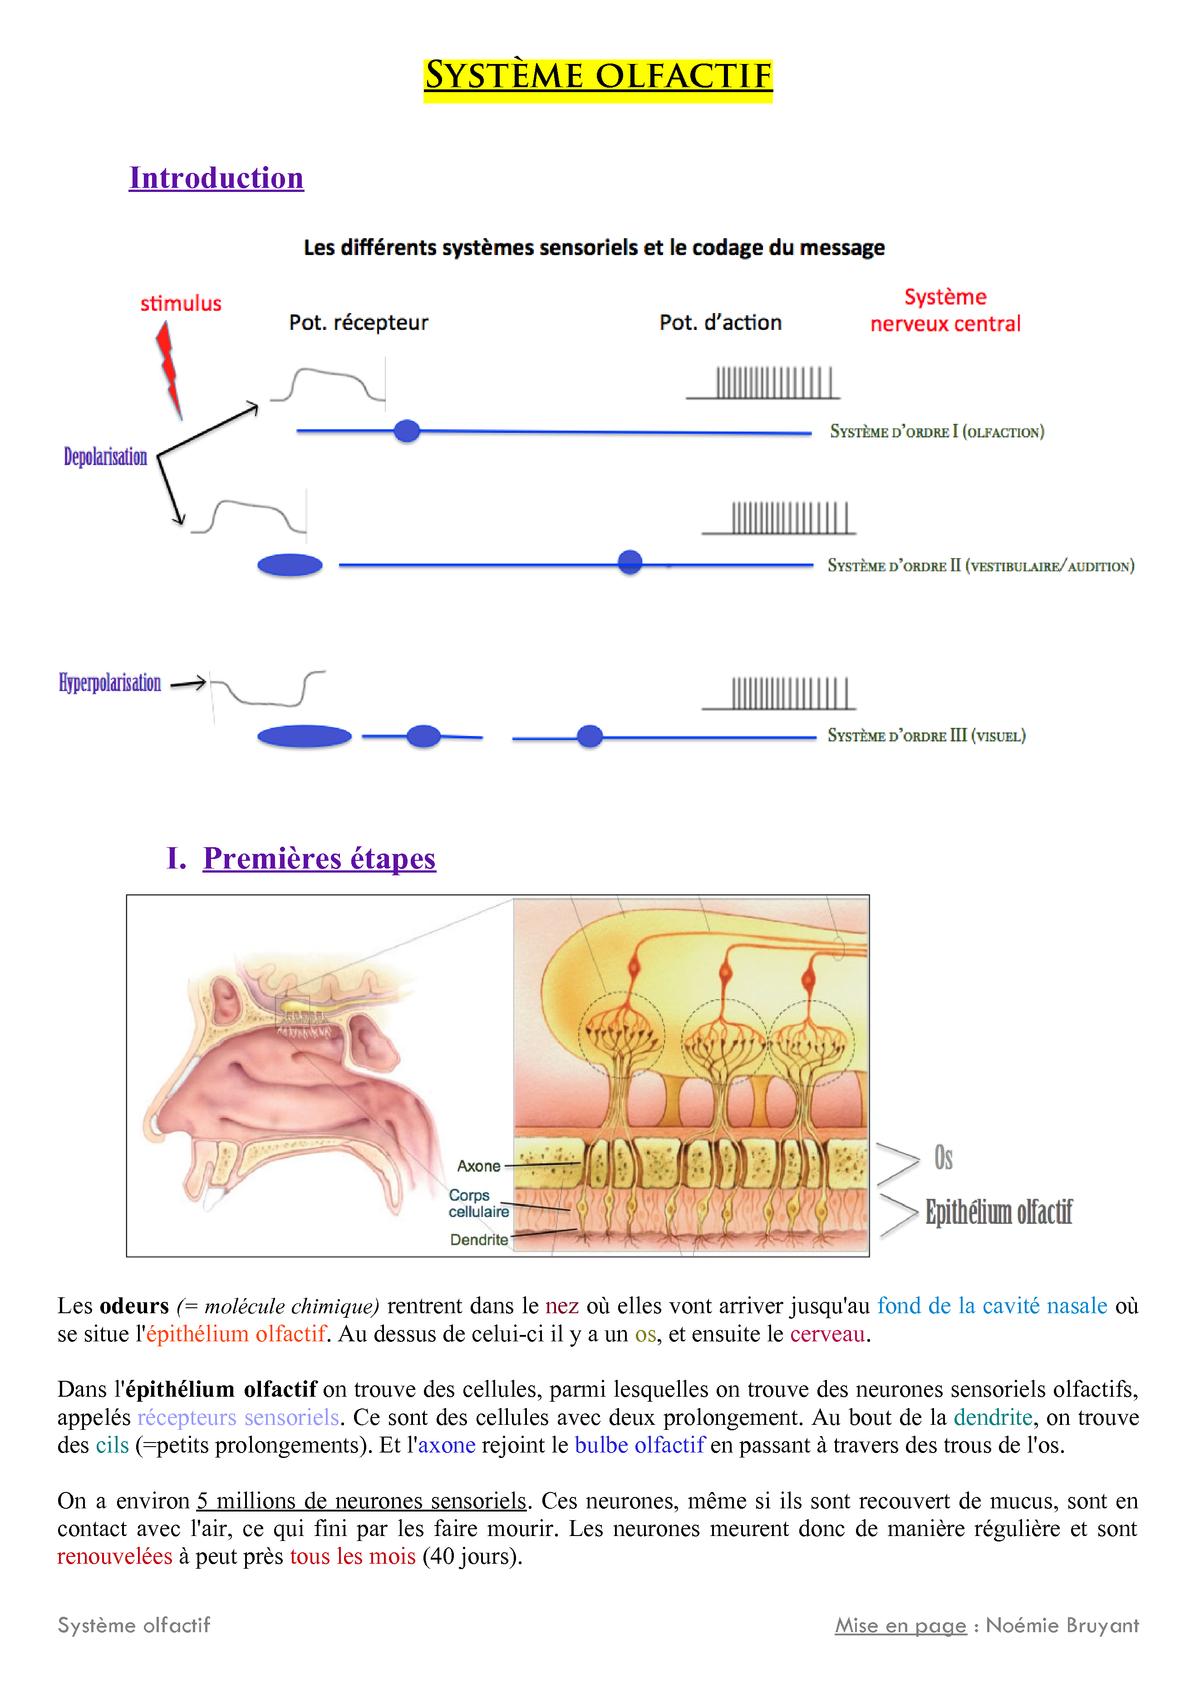 Neurosciences - Olfactif - Neurosciences - Studocu dedans ?Pith?Lium Olfactif